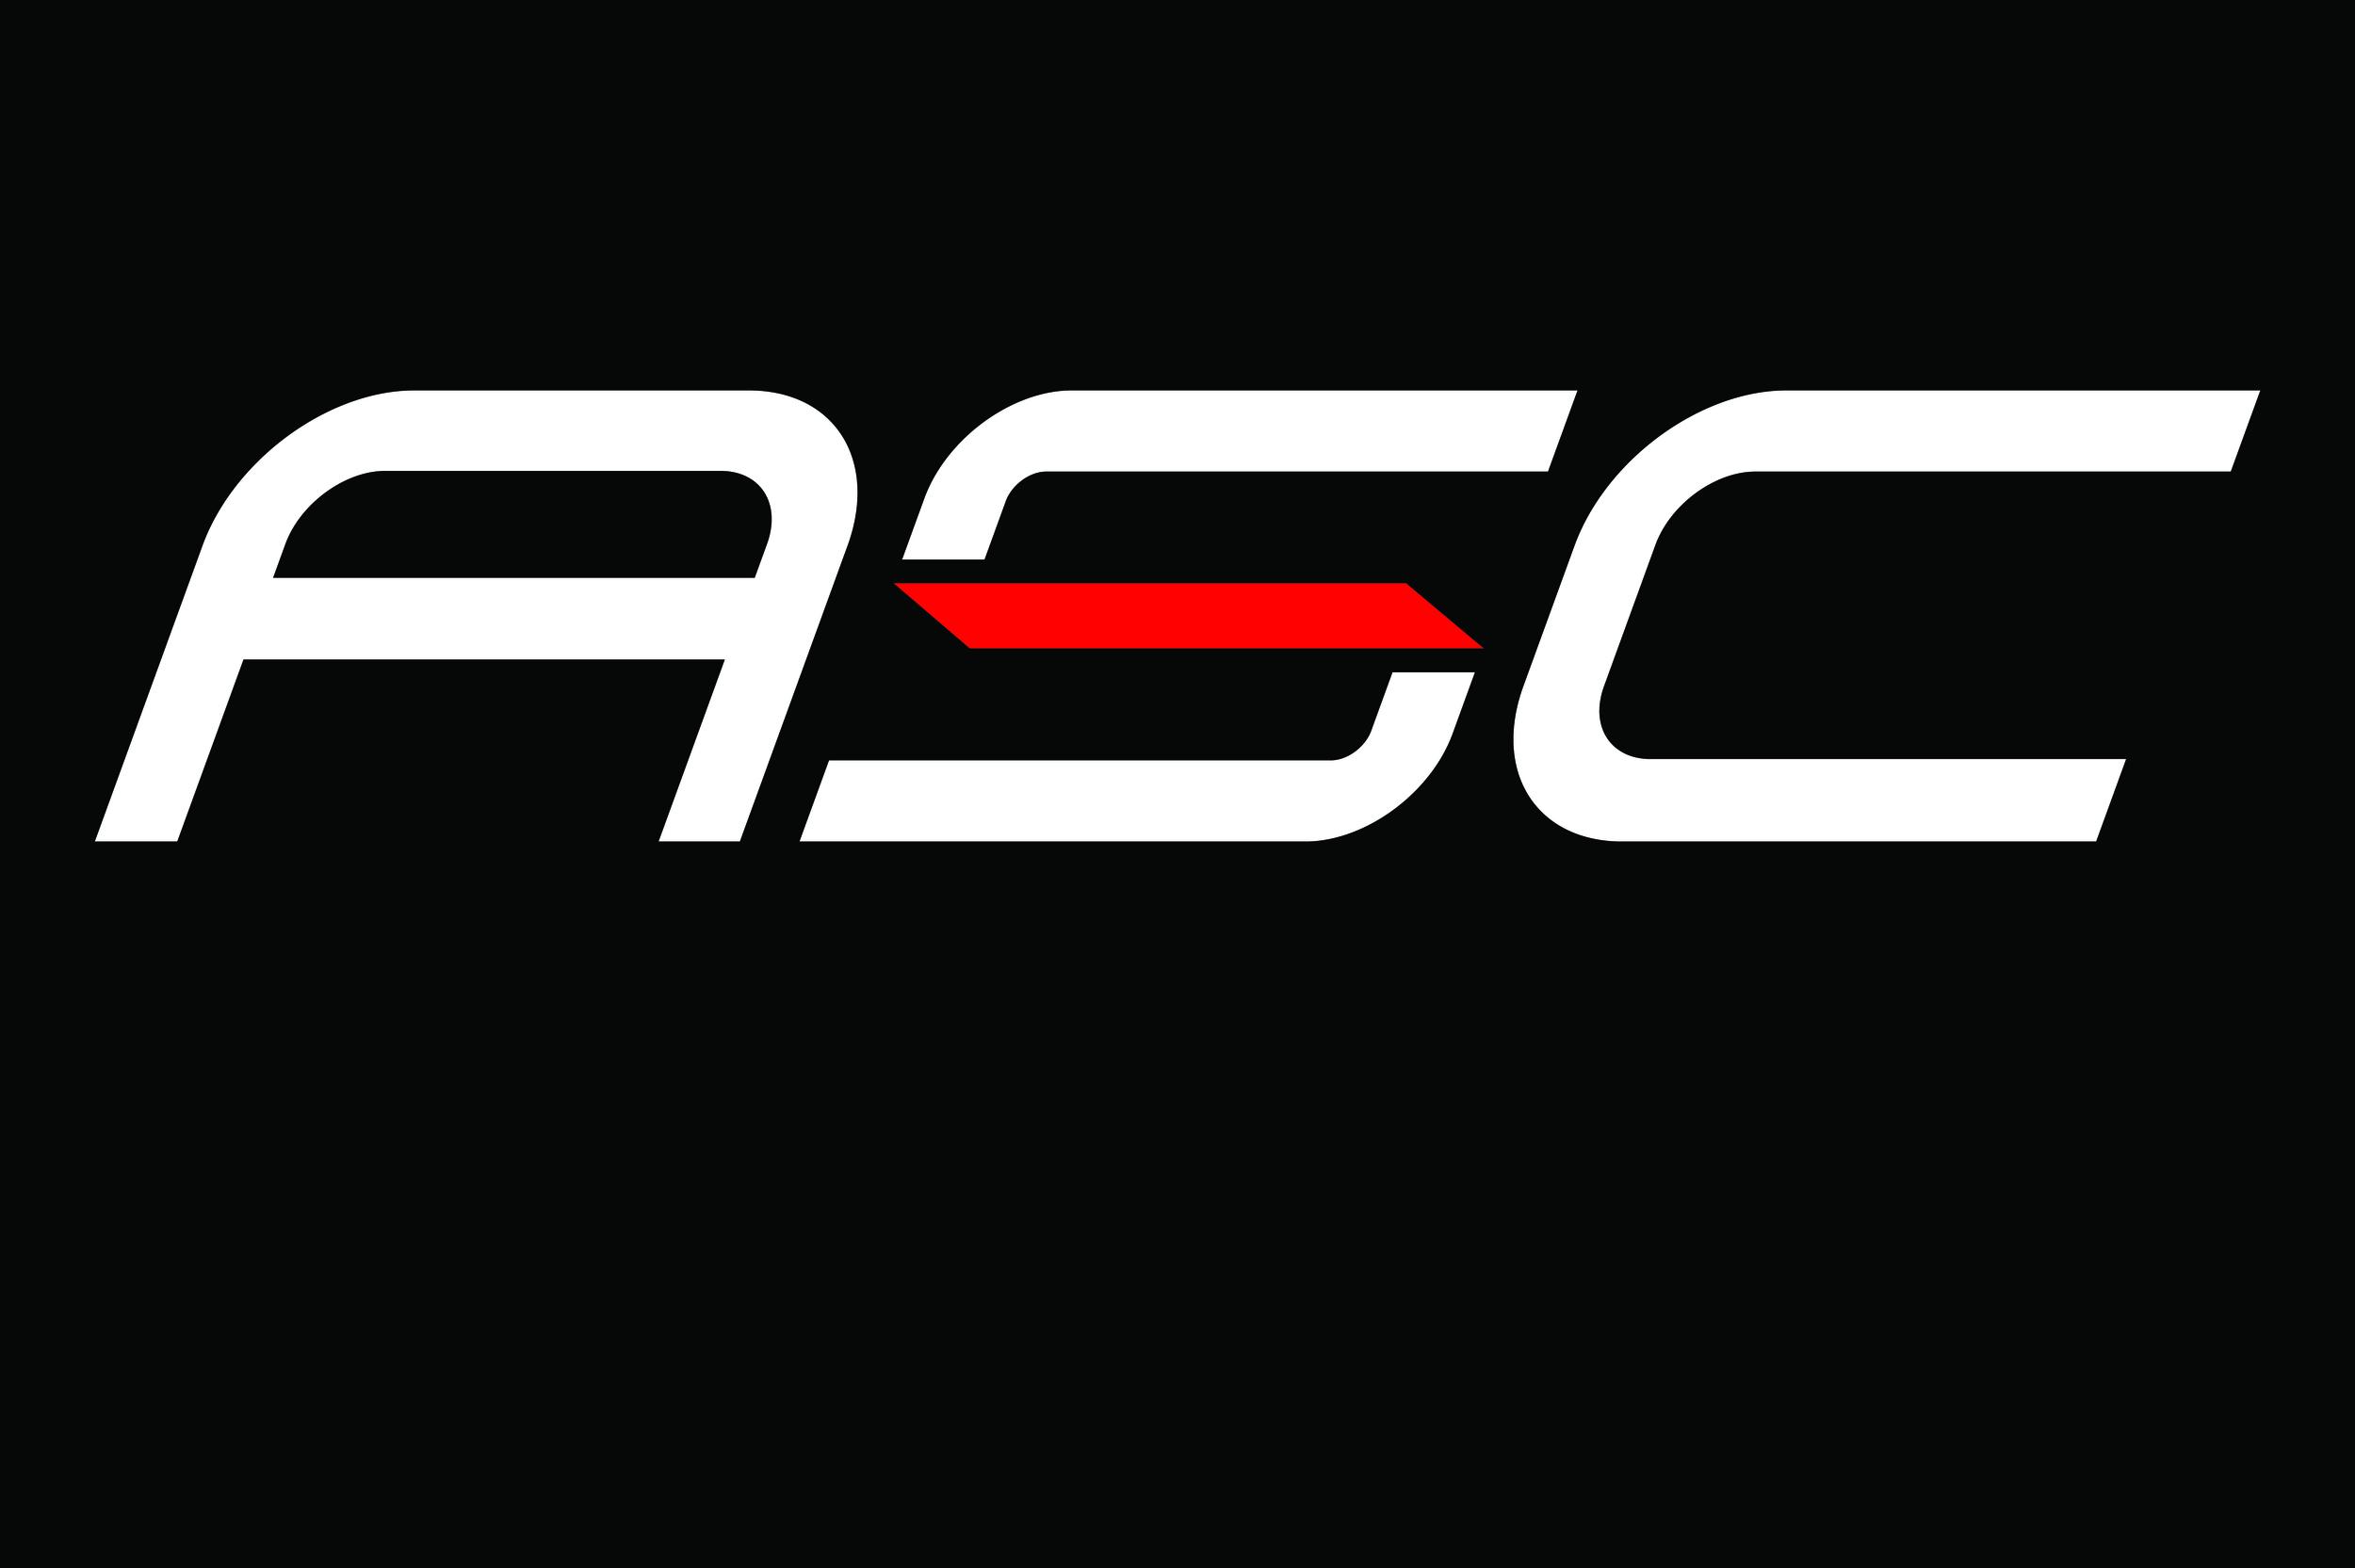 ASC2016_COPY_FINAL_VECTOR_BLACK-01.jpg